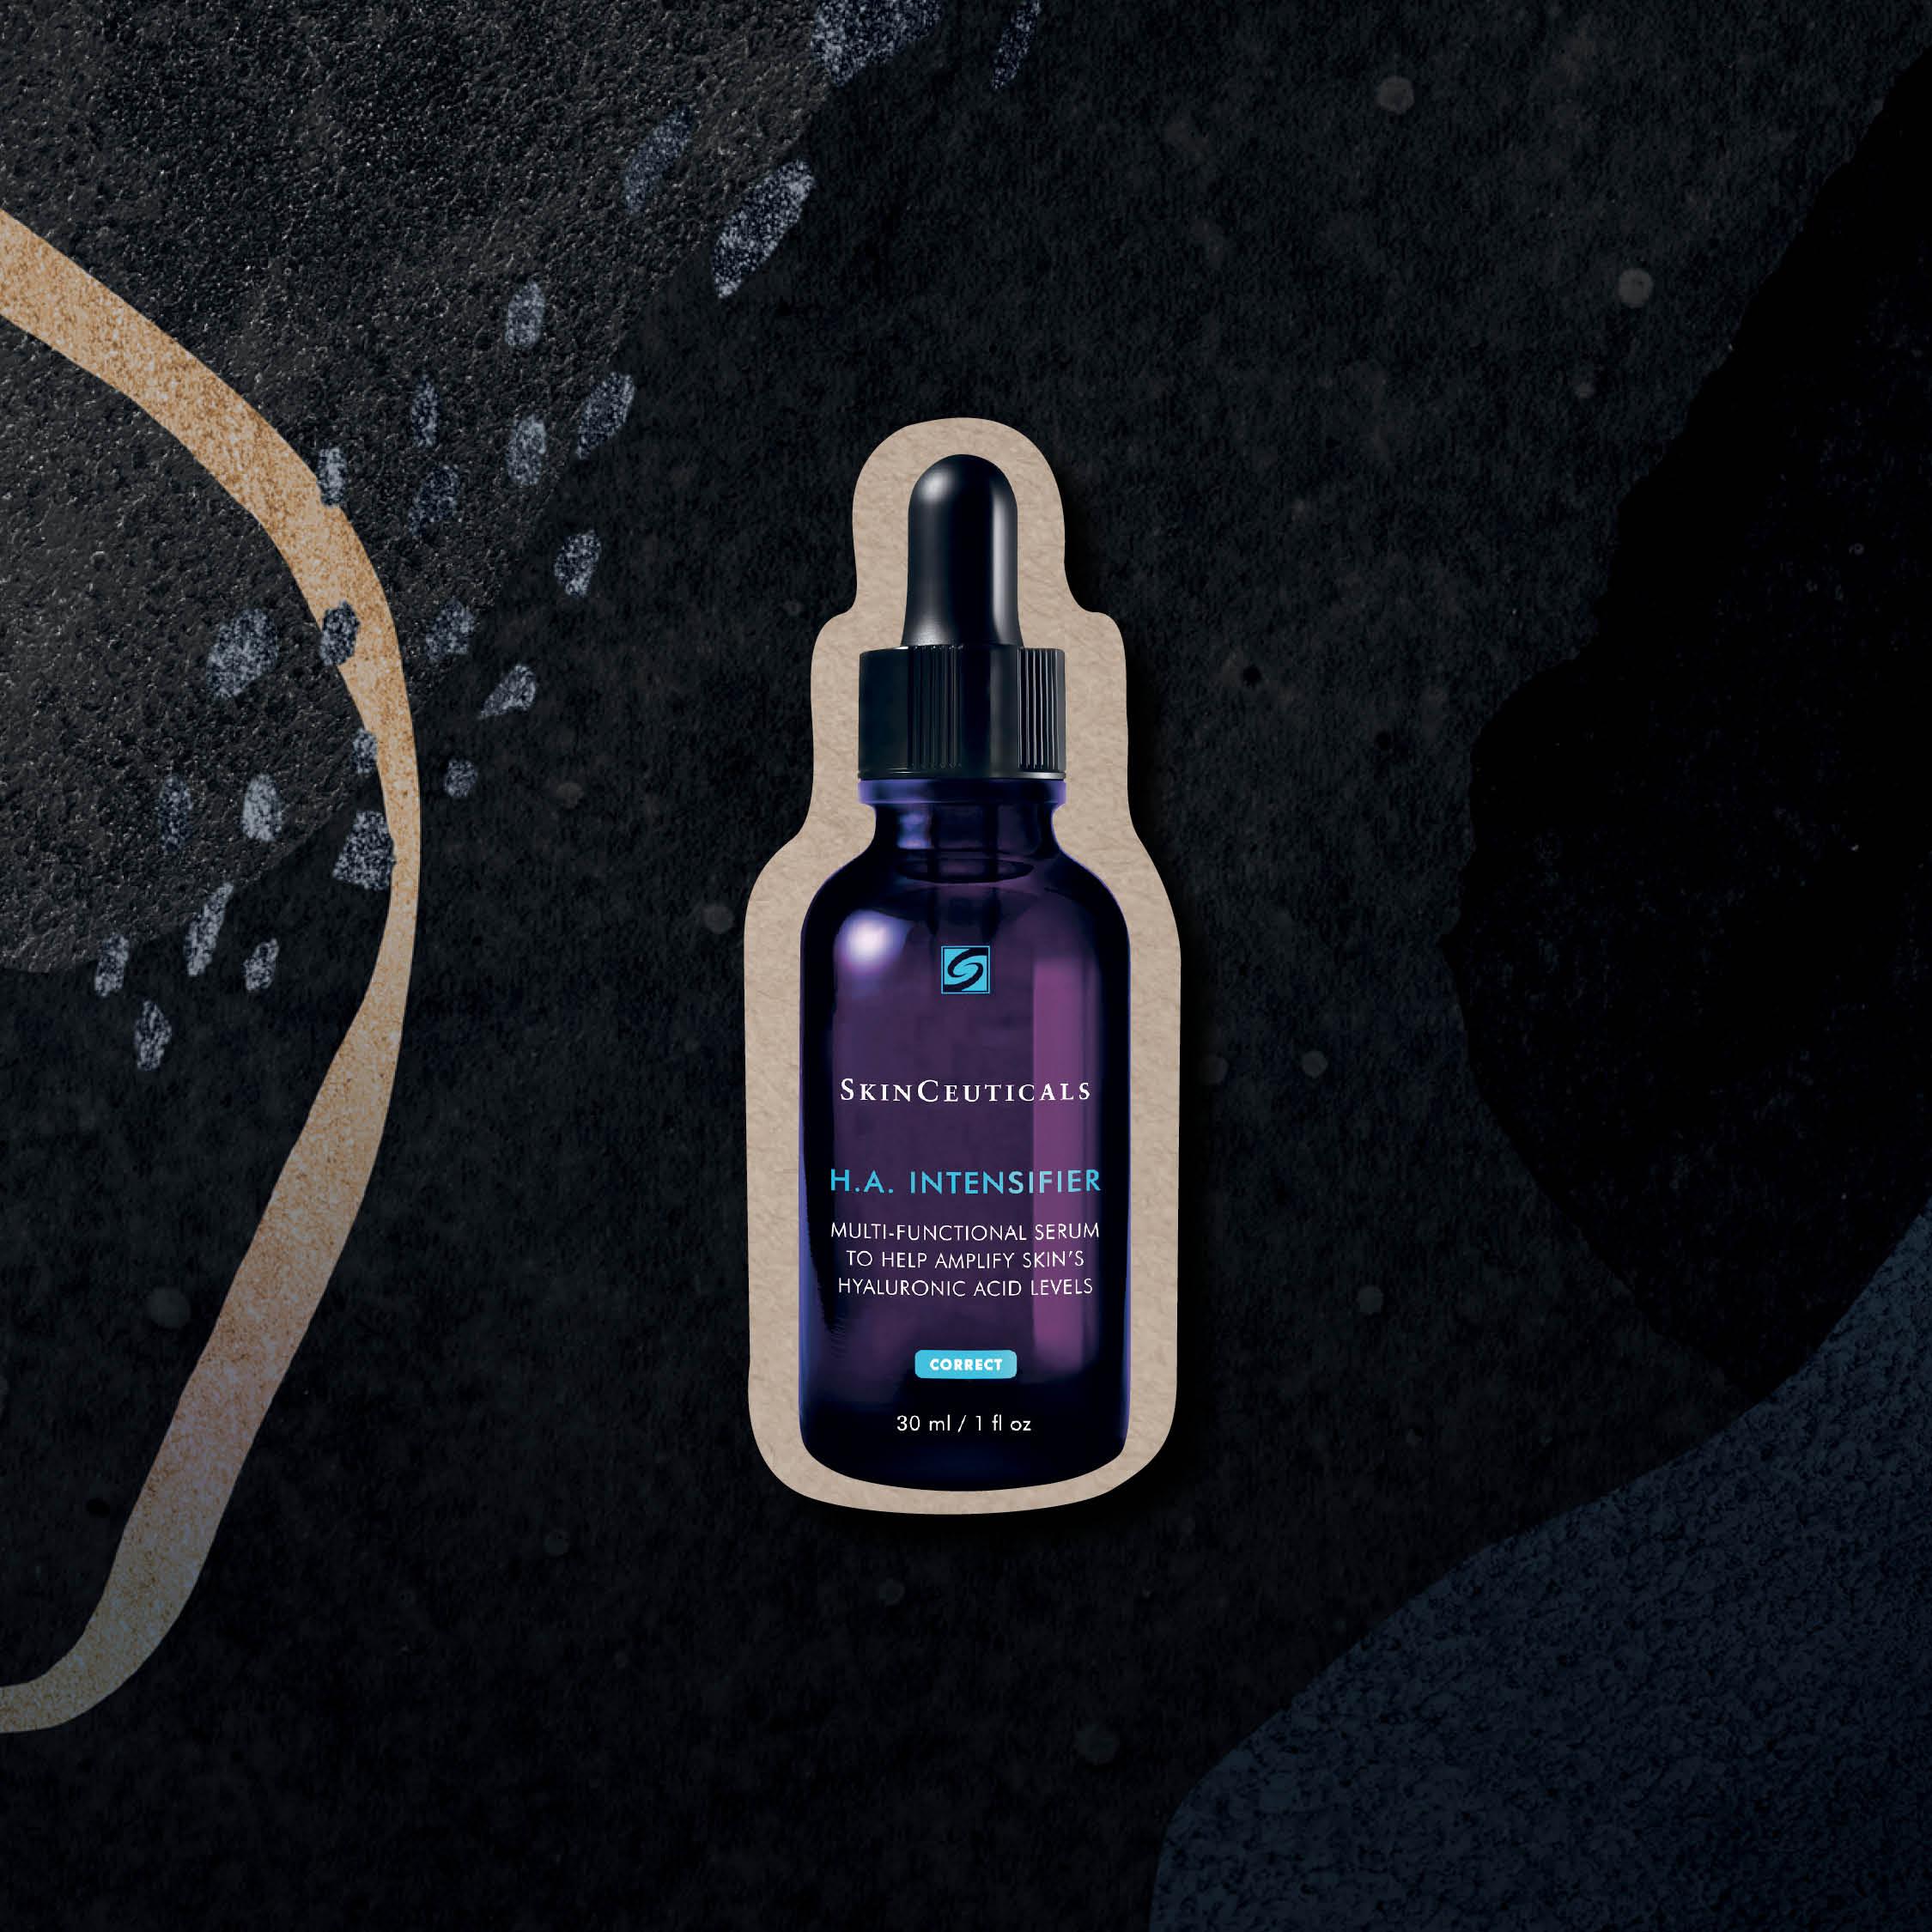 Grooming Awards 2020 - Best Serum for Dry Skin. Art Direction: Jonathan Tai